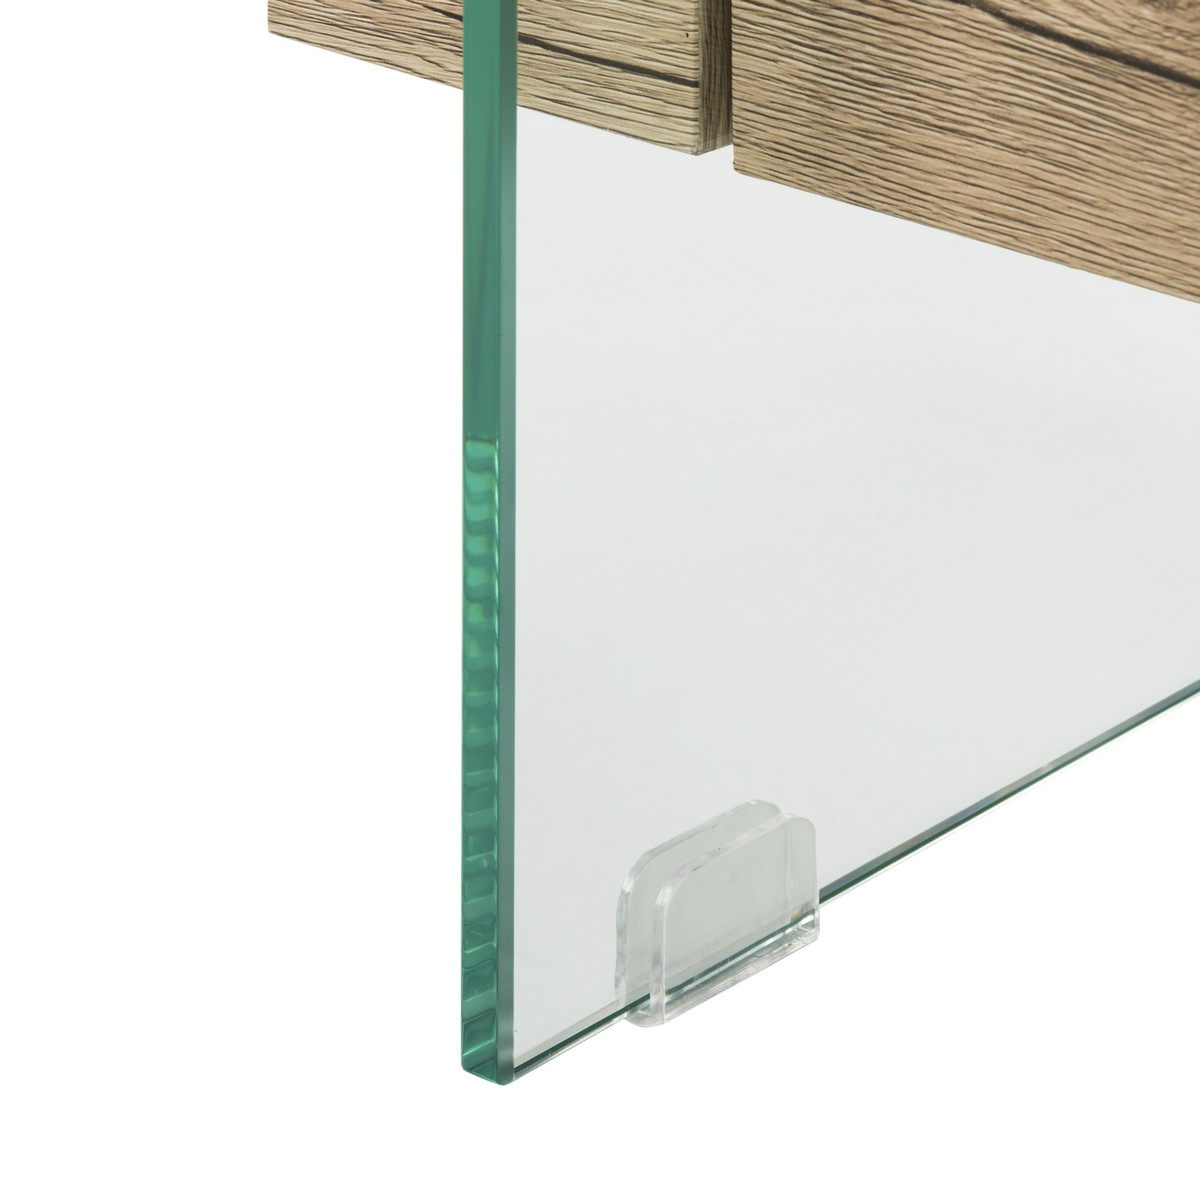 Kayley Rectangular Modern Glass Coffee Table